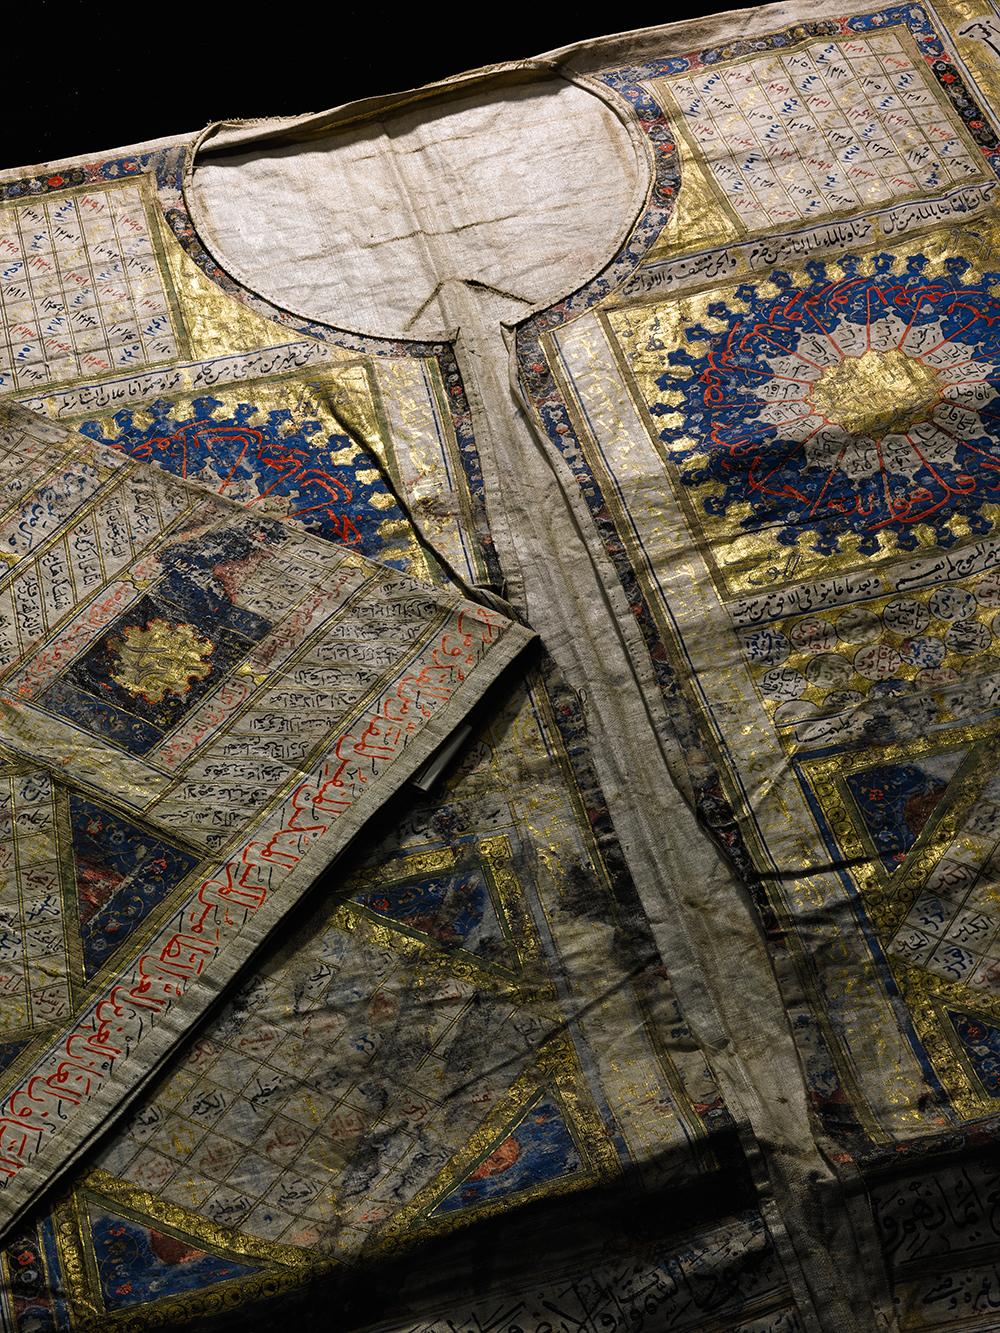 Sotheby's, talismanic shirt